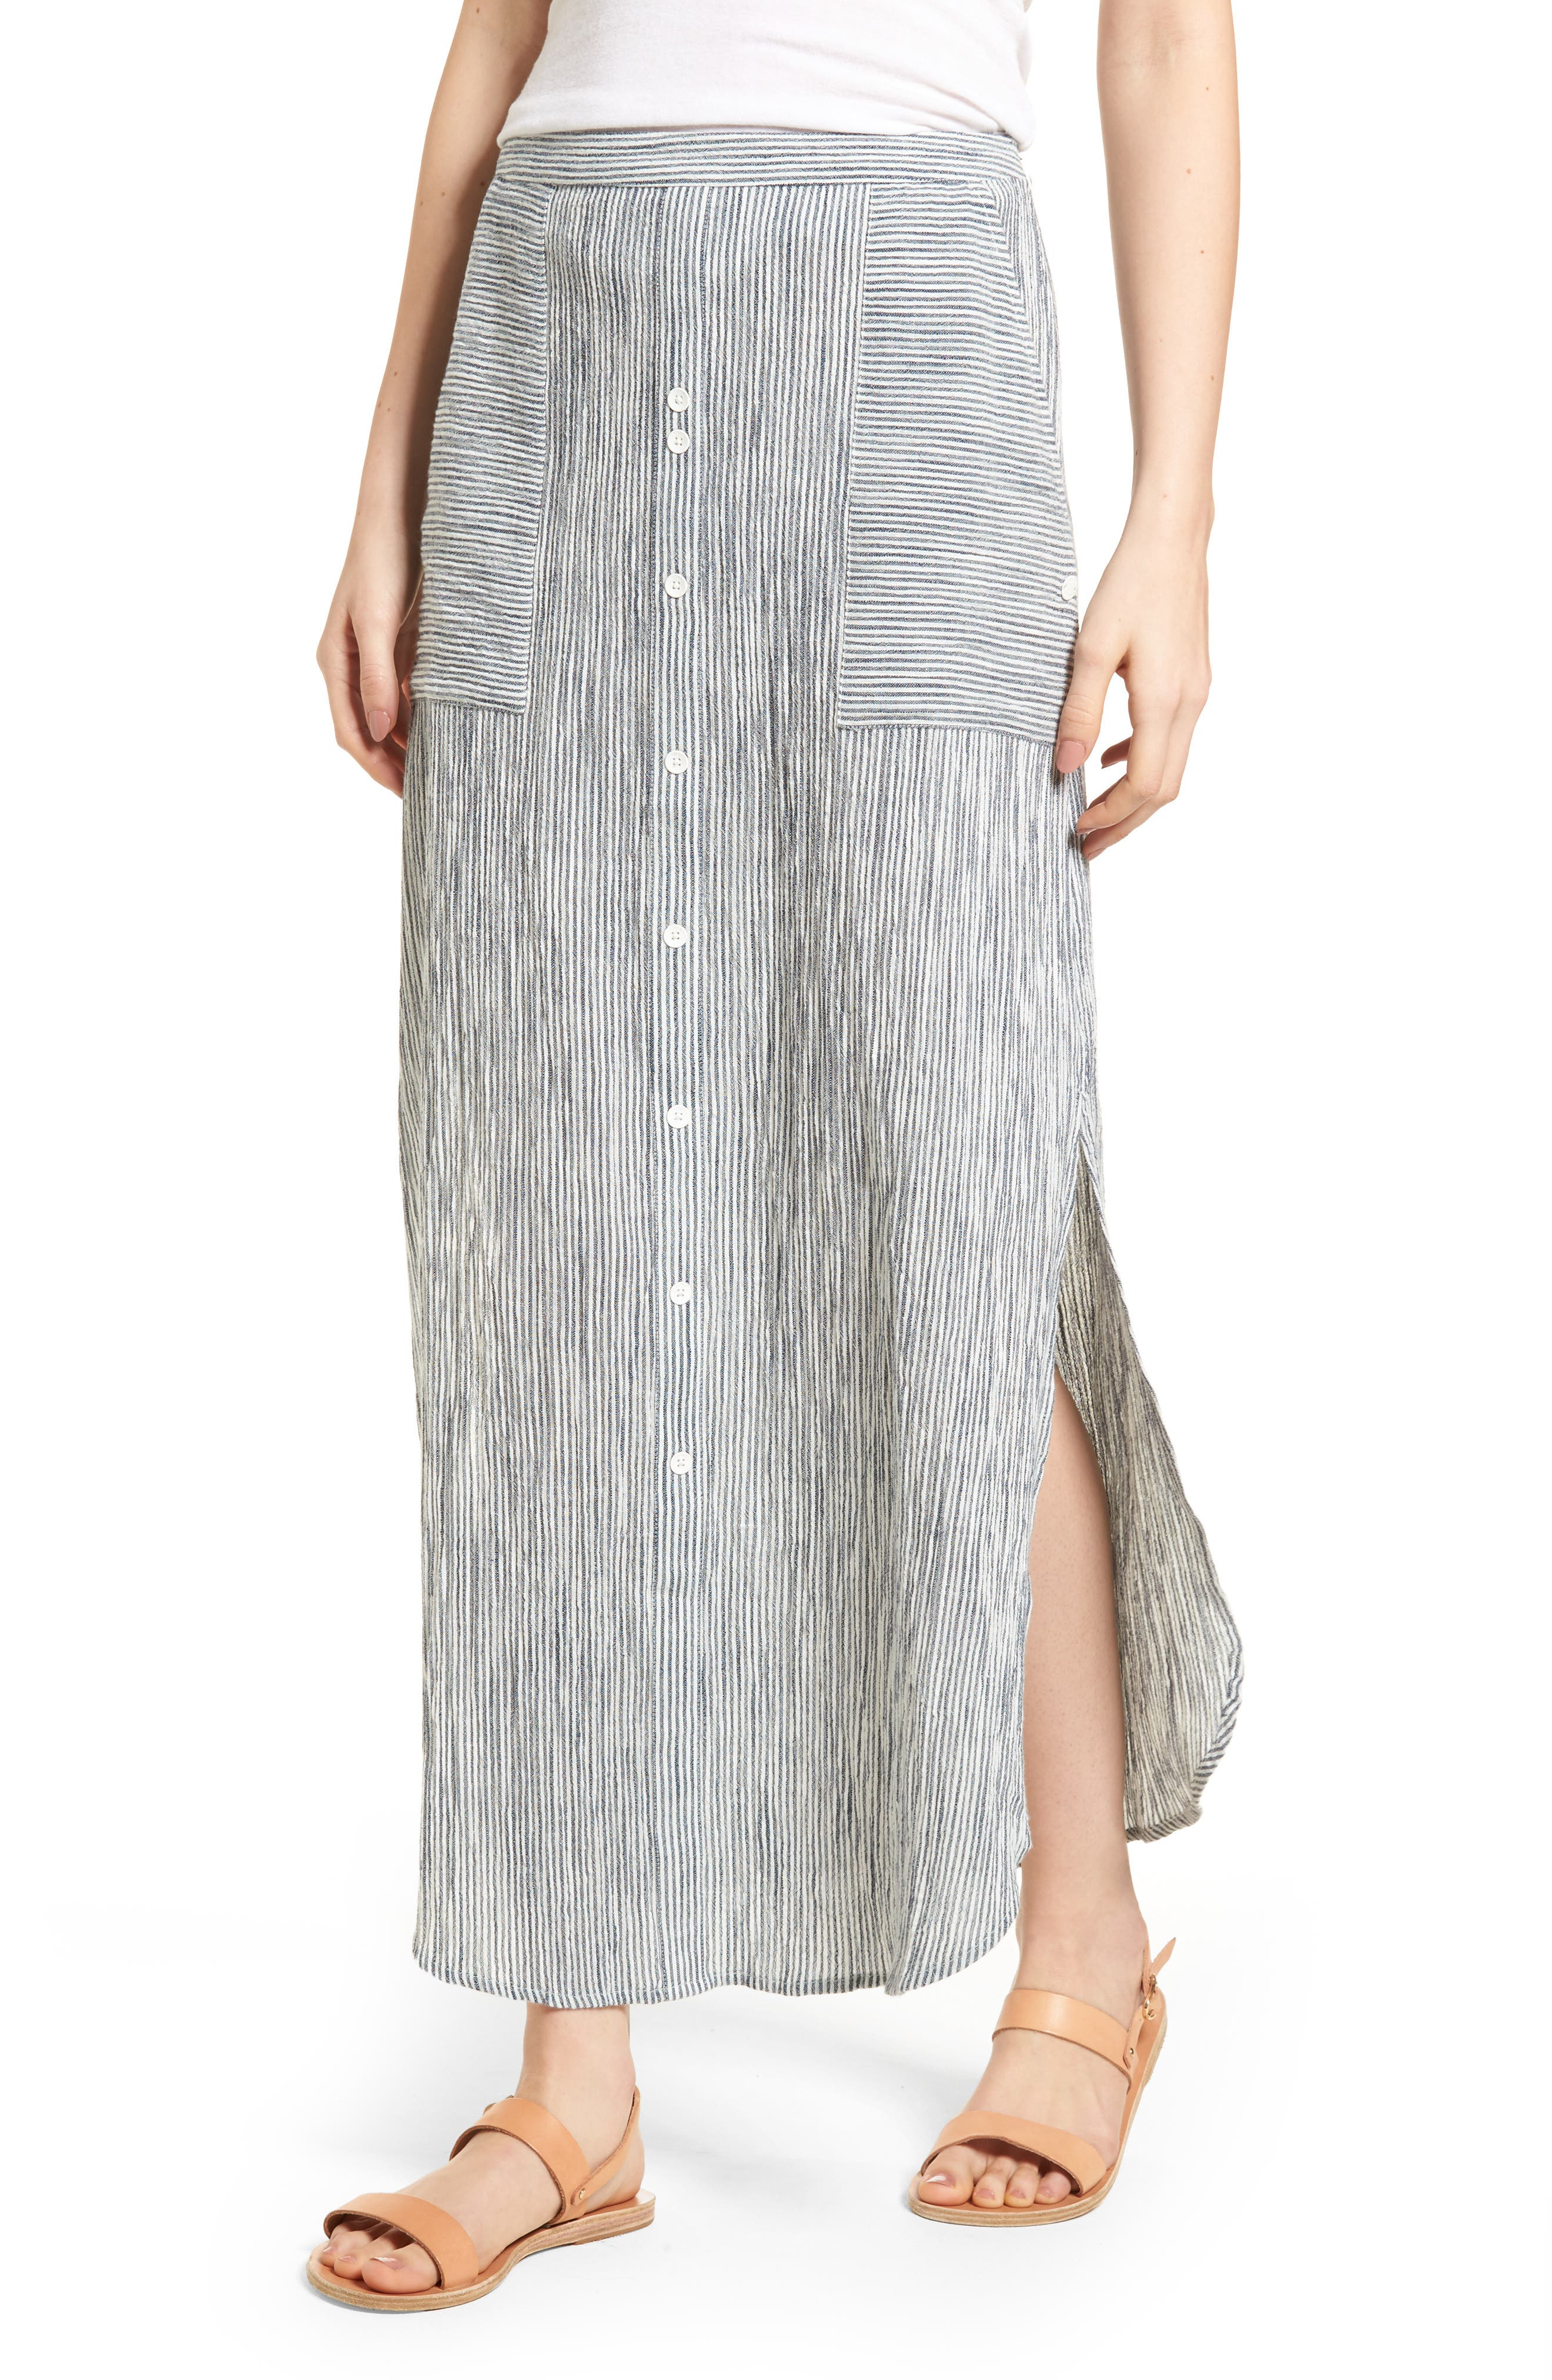 Sunset Islands Pinstripe Maxi Skirt,                         Main,                         color,